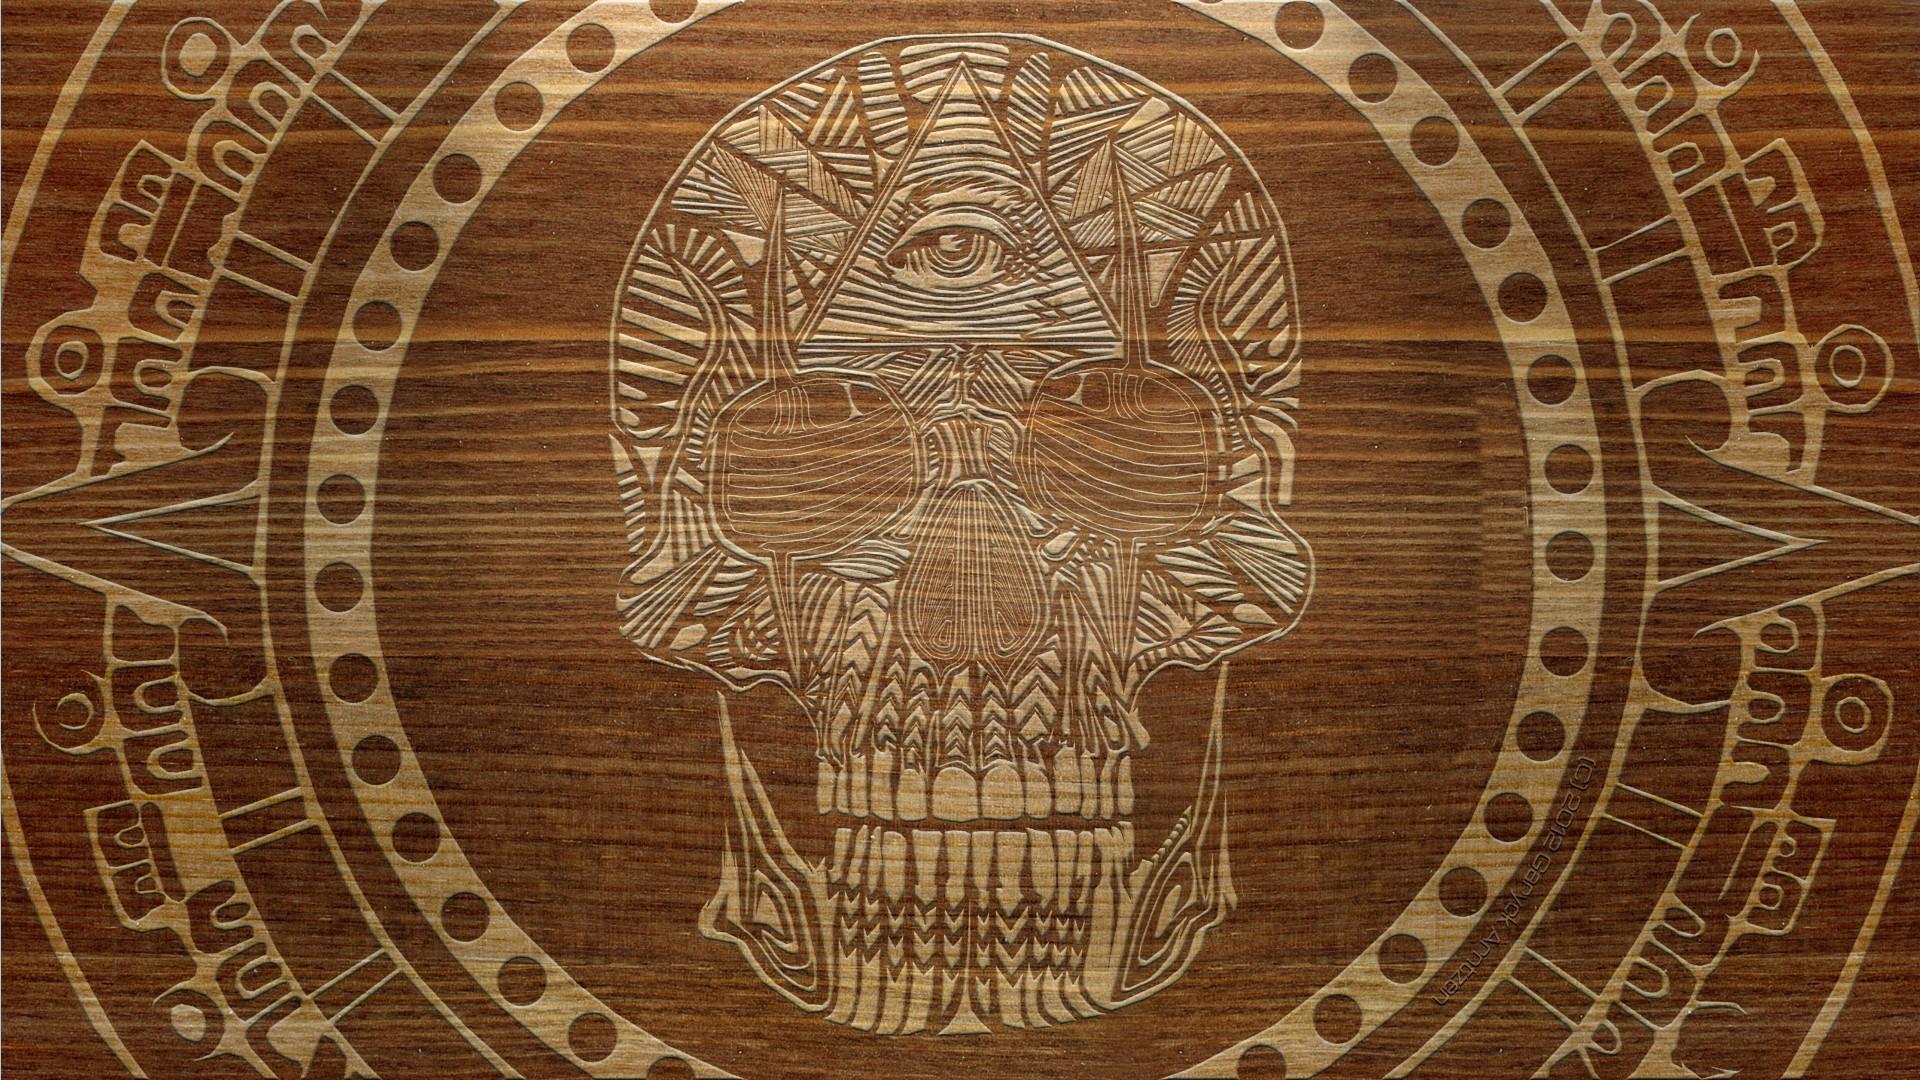 Patterns masonic digital art engraving symbol carving wallpaper 1920x1080